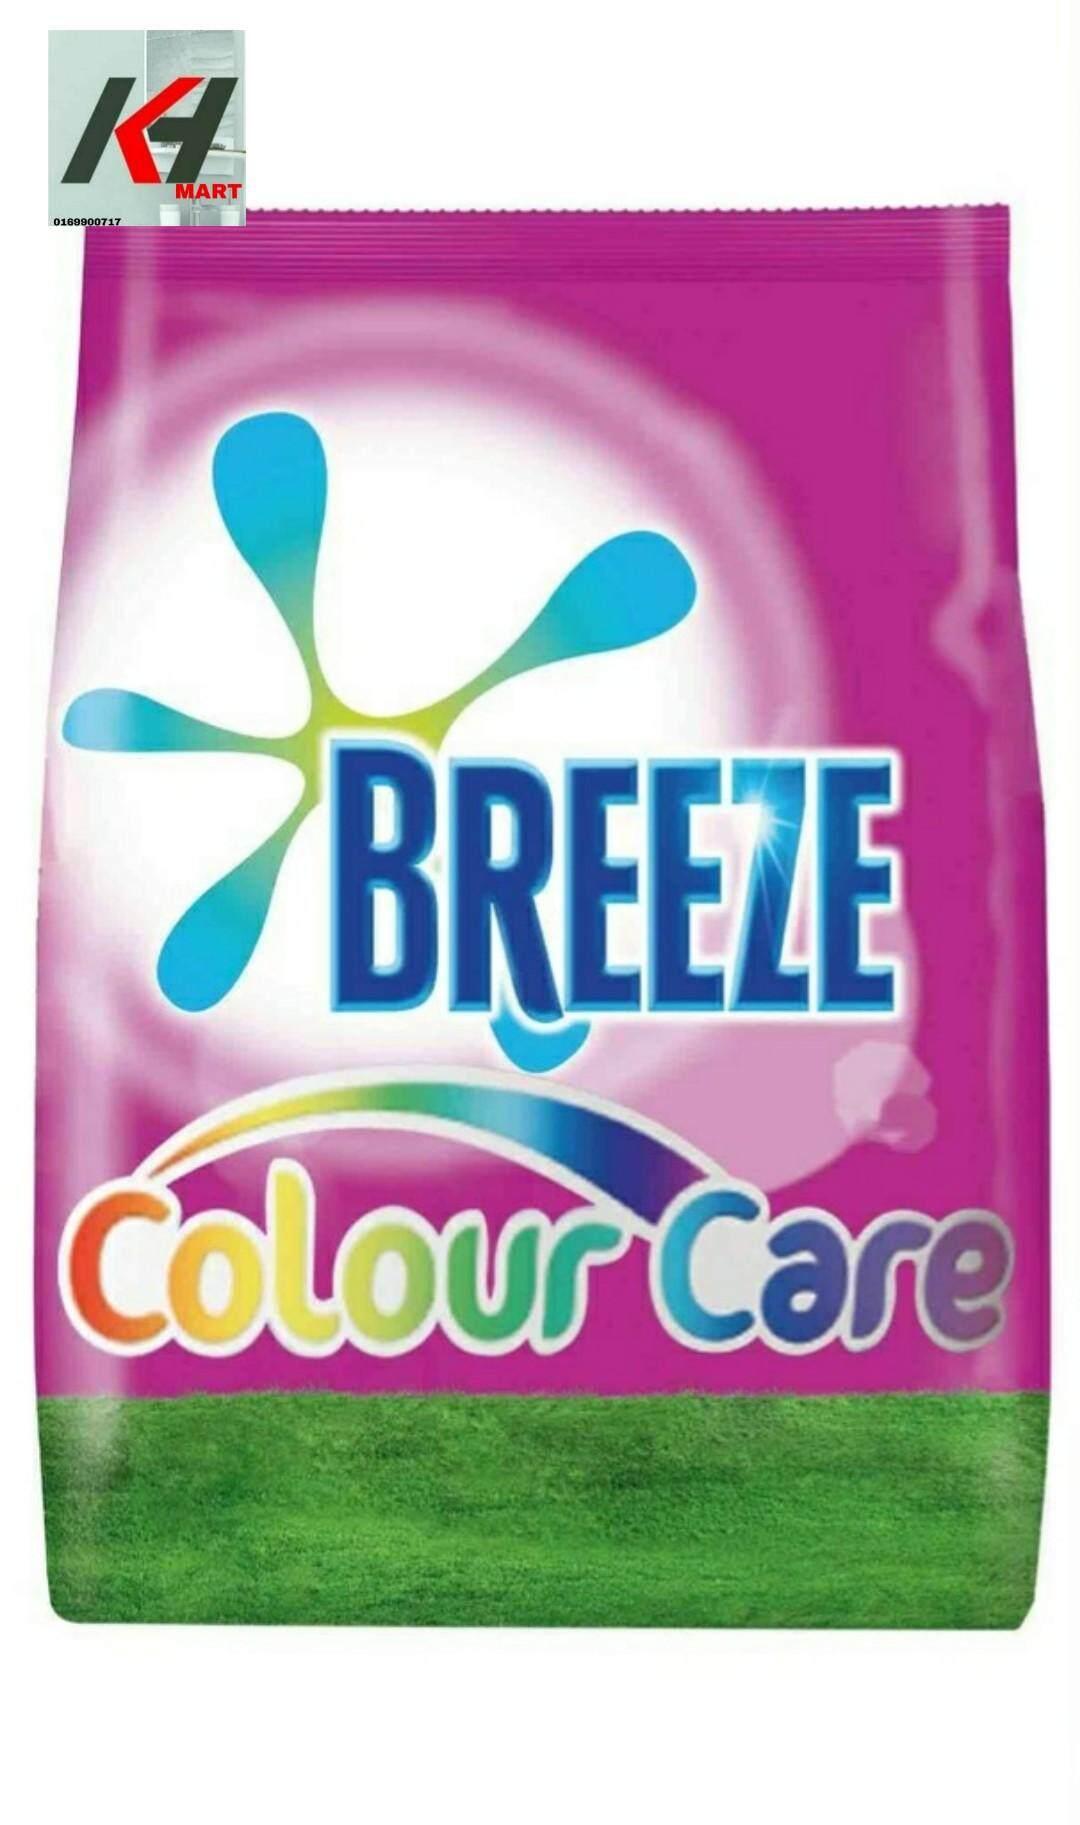 Breeze Detergent Powder - READY STOCK  - 750G